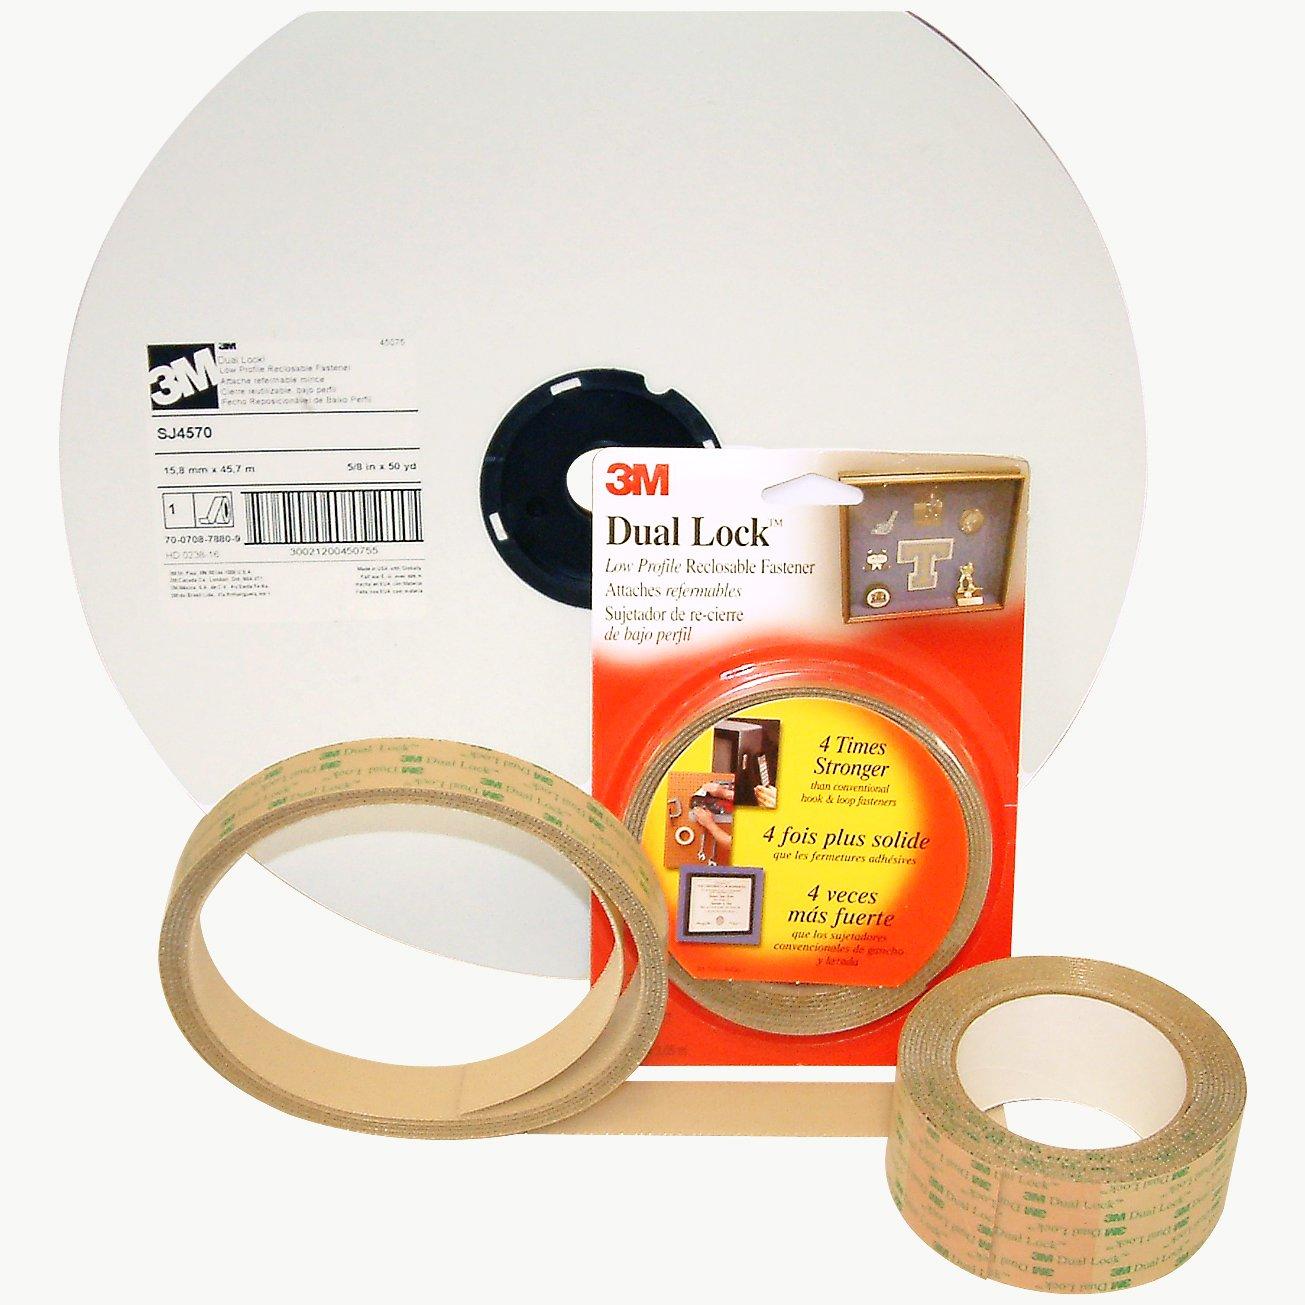 Amazon.com: 3M Scotch SJ4570 Dual Lock Low Profile Reclosable Fastener: 5/8 in. x 10 ft. (Clear): Home Improvement